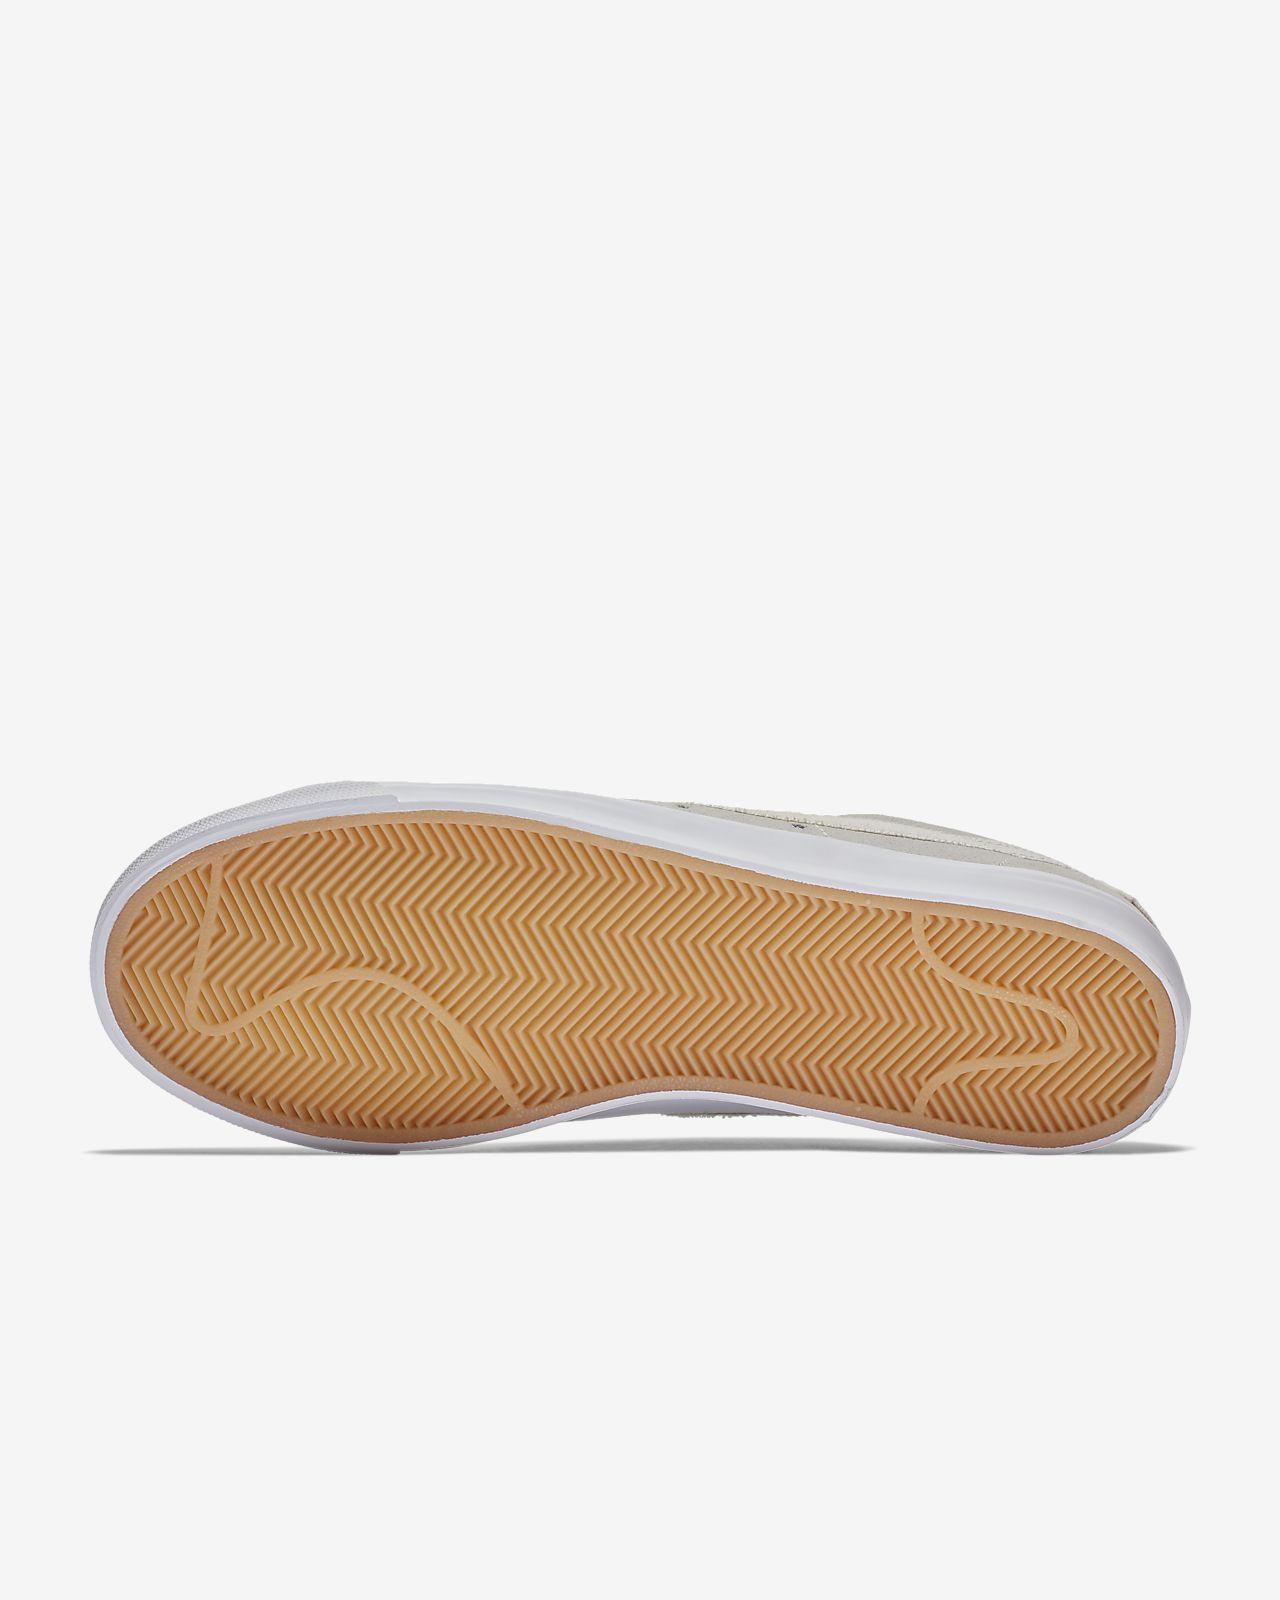 new concept ffff0 4ad78 ... Nike SB Blazer Low GT Skate Shoe